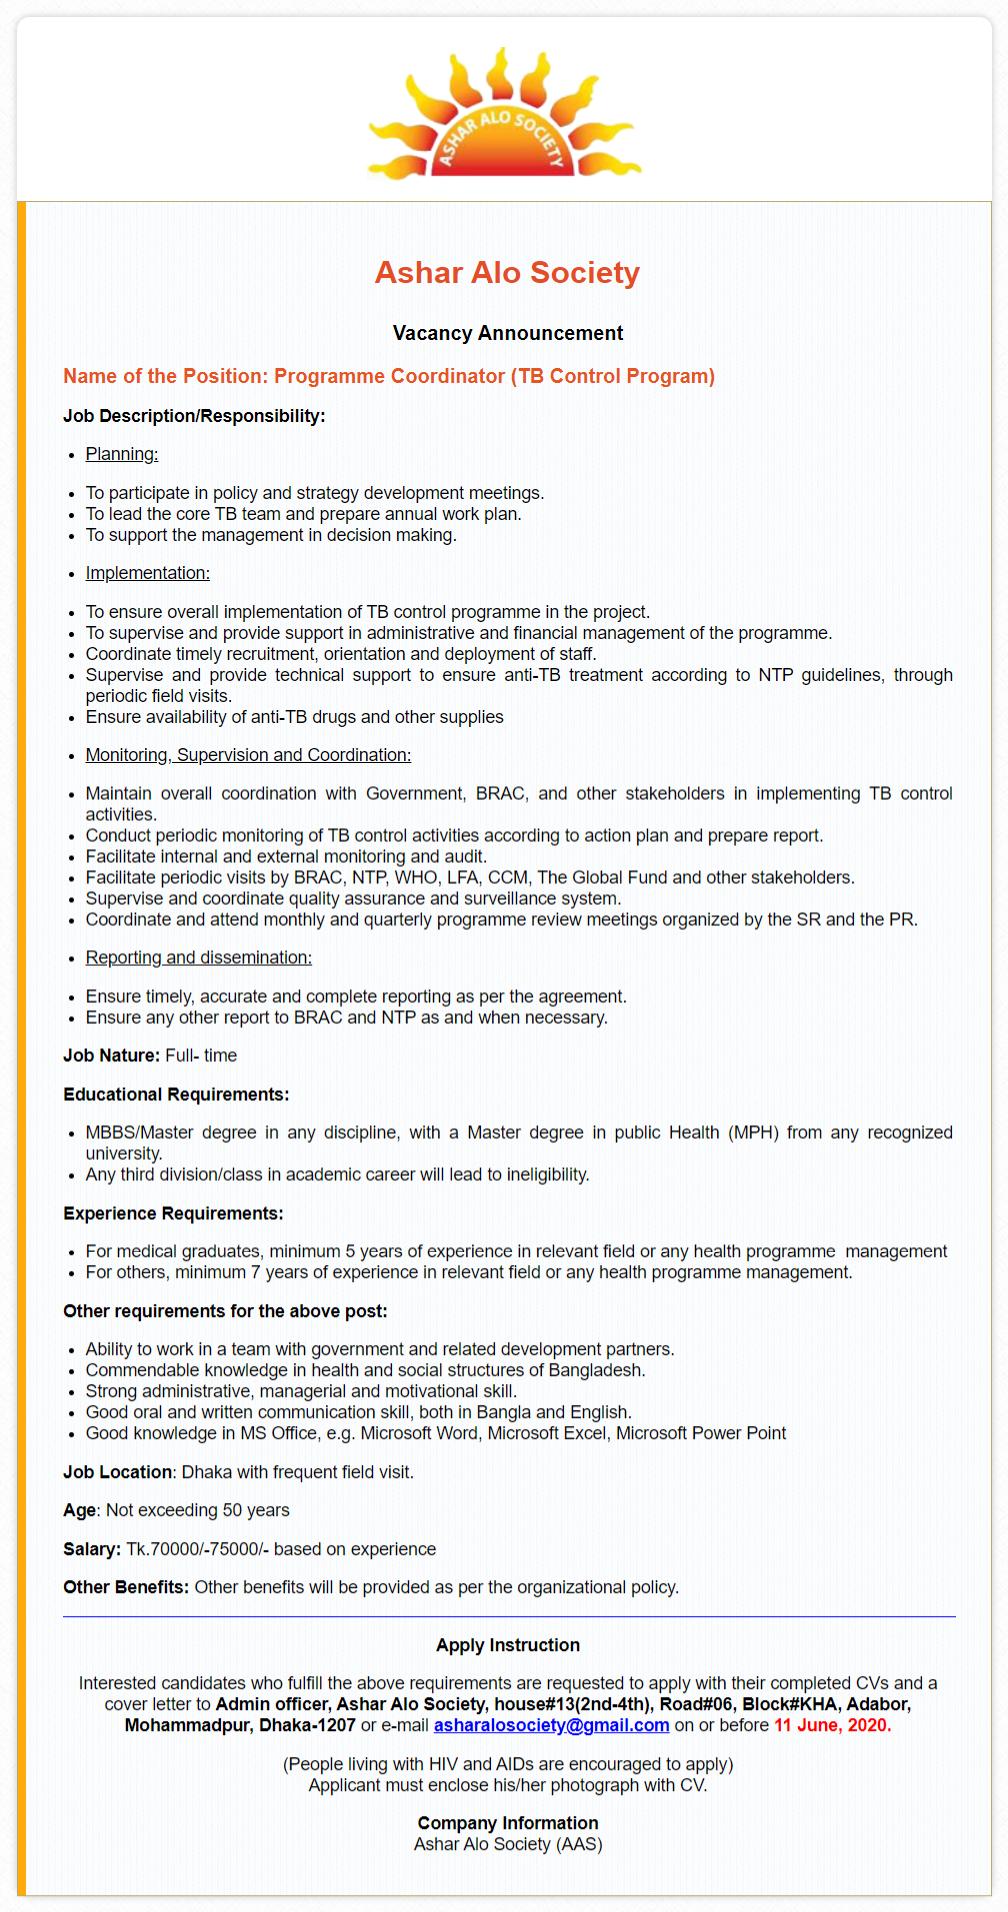 Ashar Alo Society (AAS) Job Circular 2020